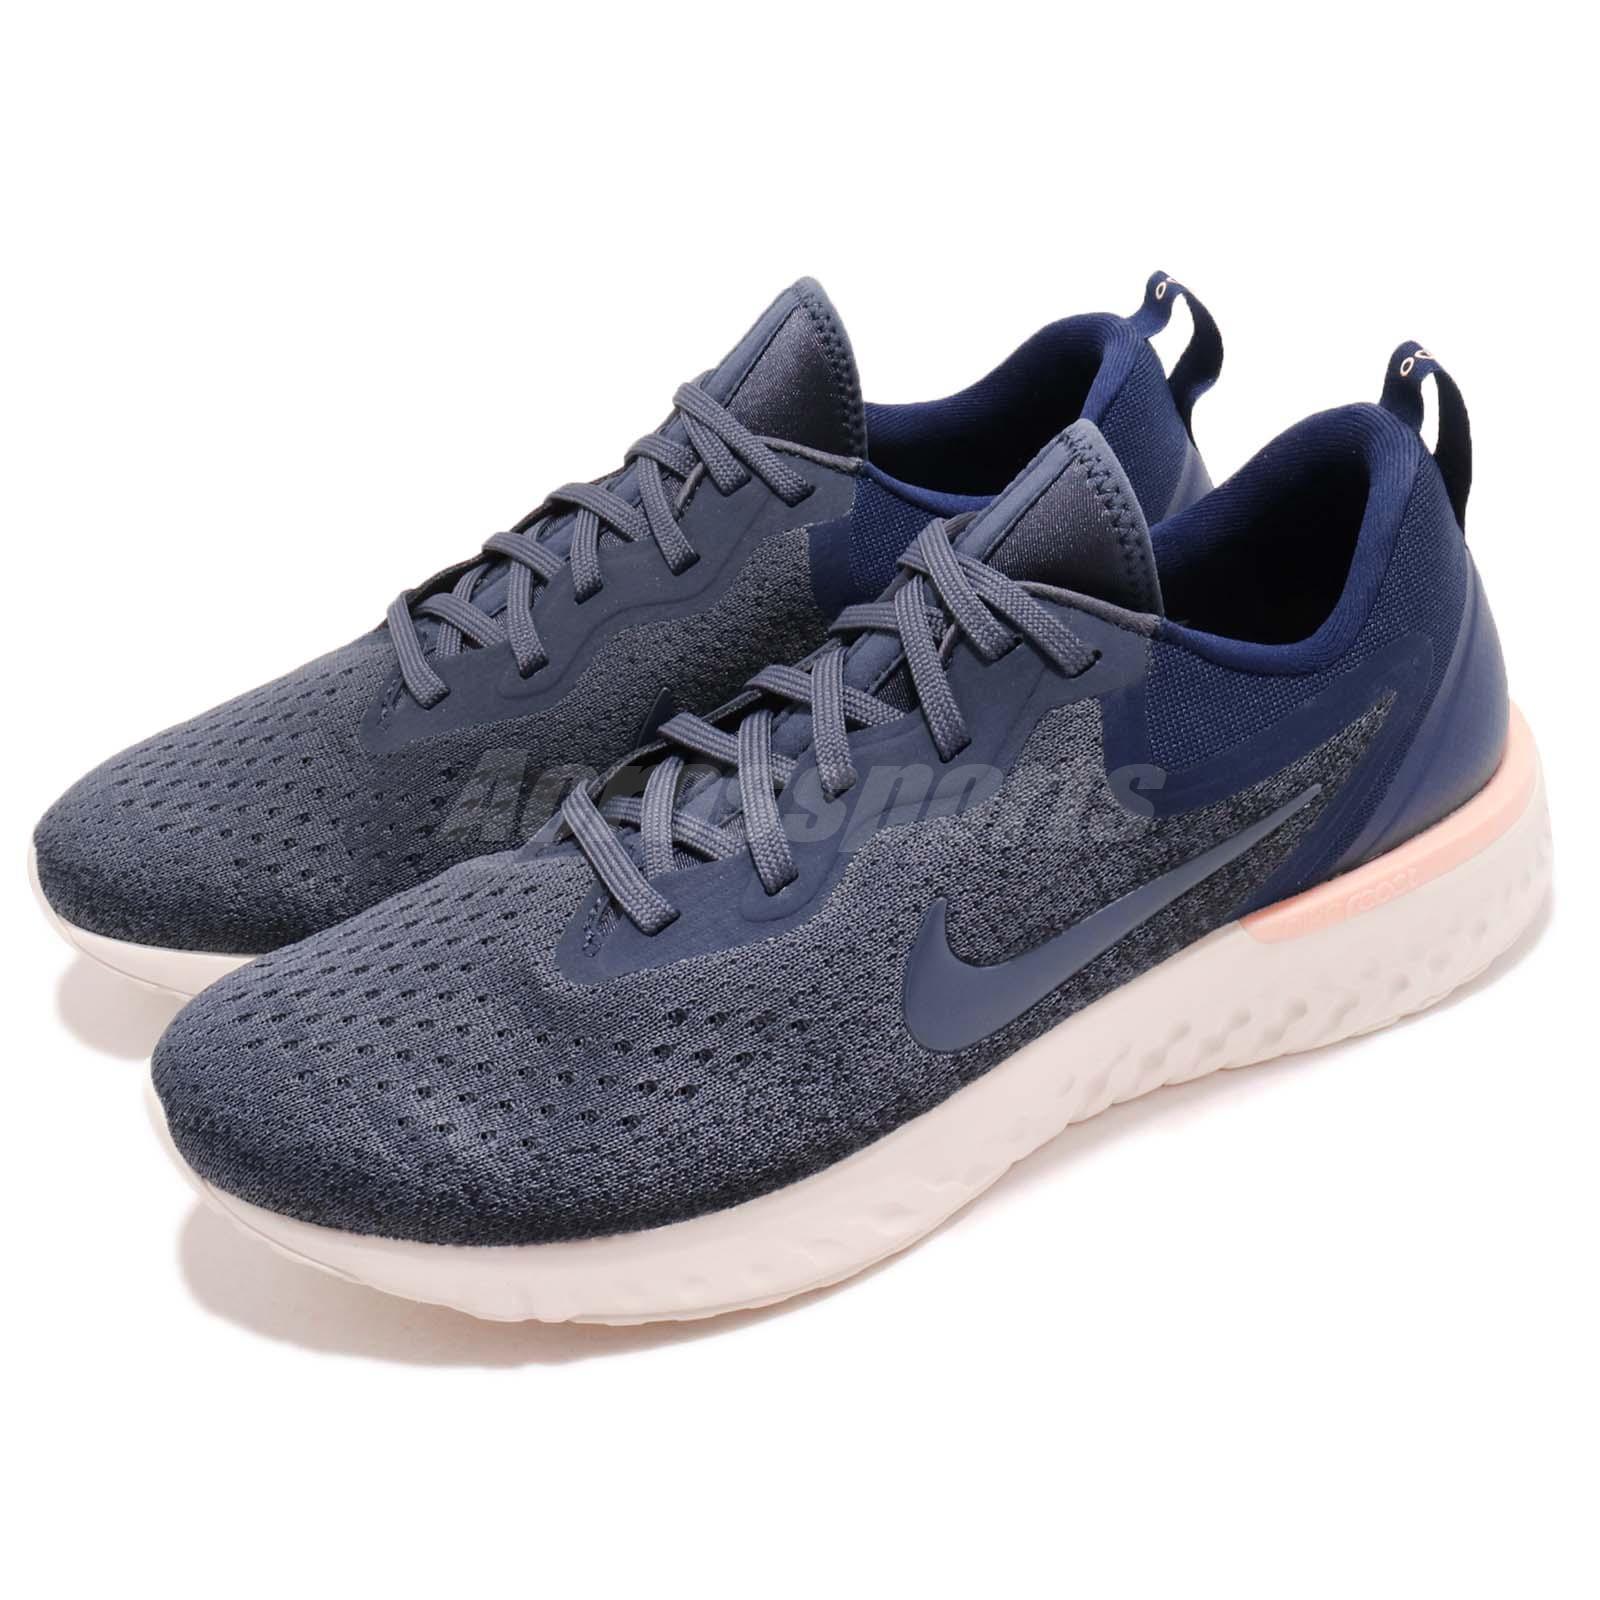 Nike Odyssey React Thunder Blue Void